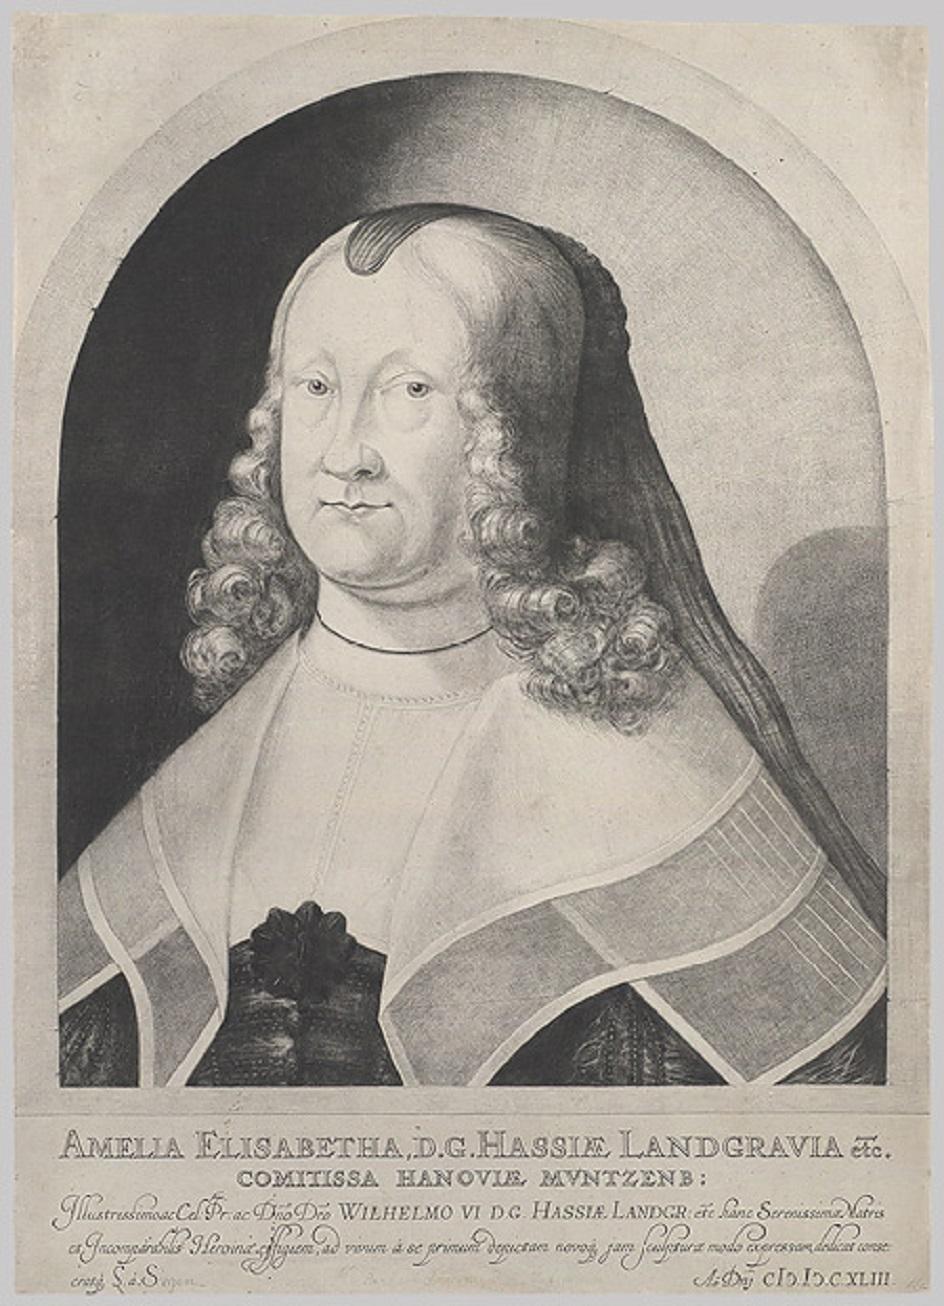 Меццо-тинто. Людвиг фон Зиген. Гравюра «Портрет Амелии Элизабет фон Гессен», 1642